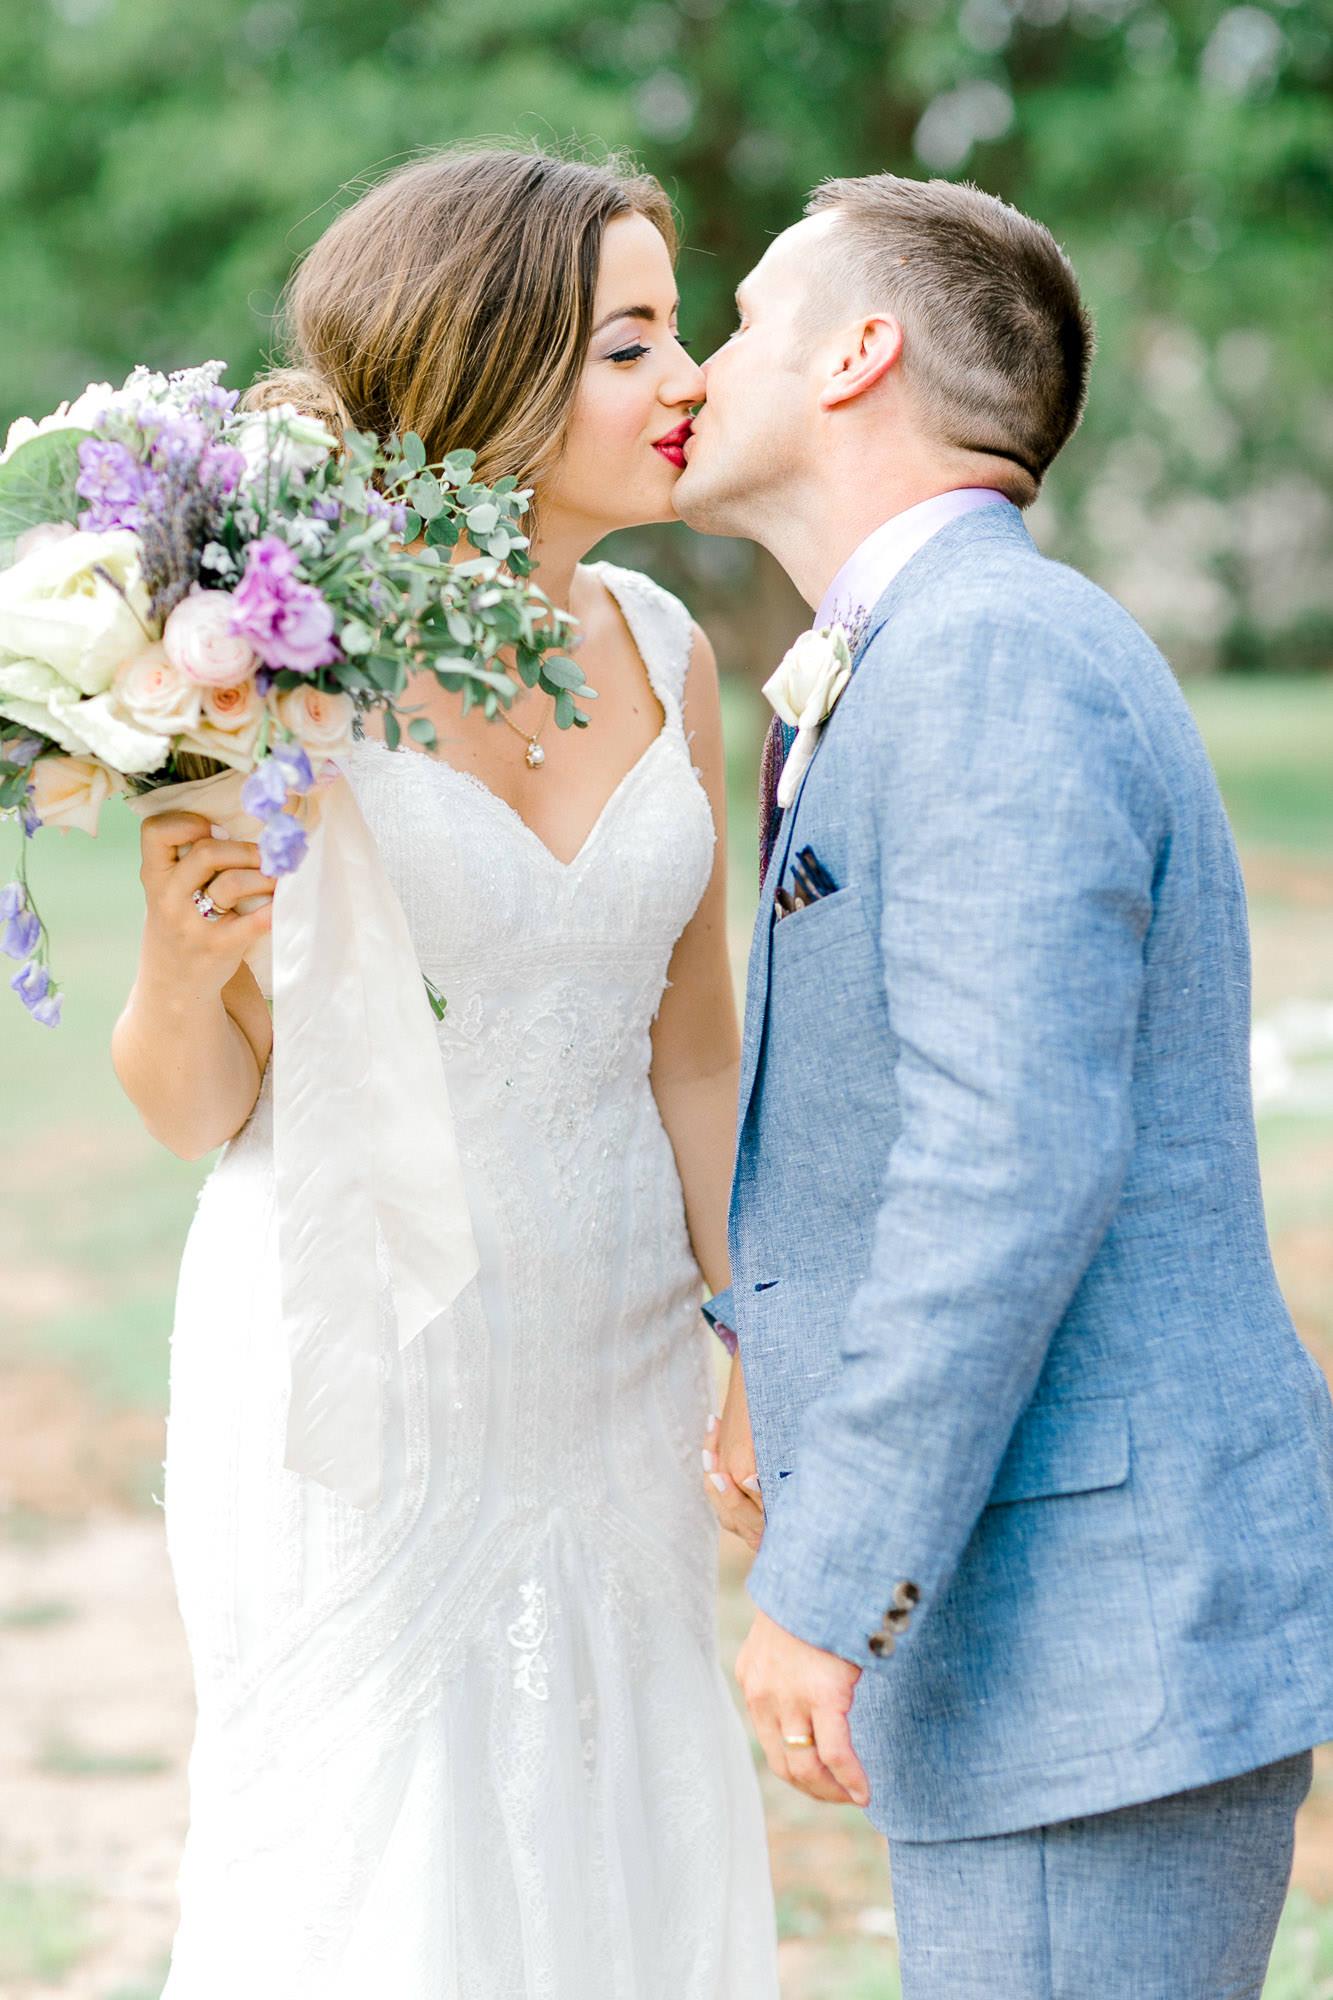 alexis-joel-laury-lubbock-weddingphotographer-alleej0027.jpg